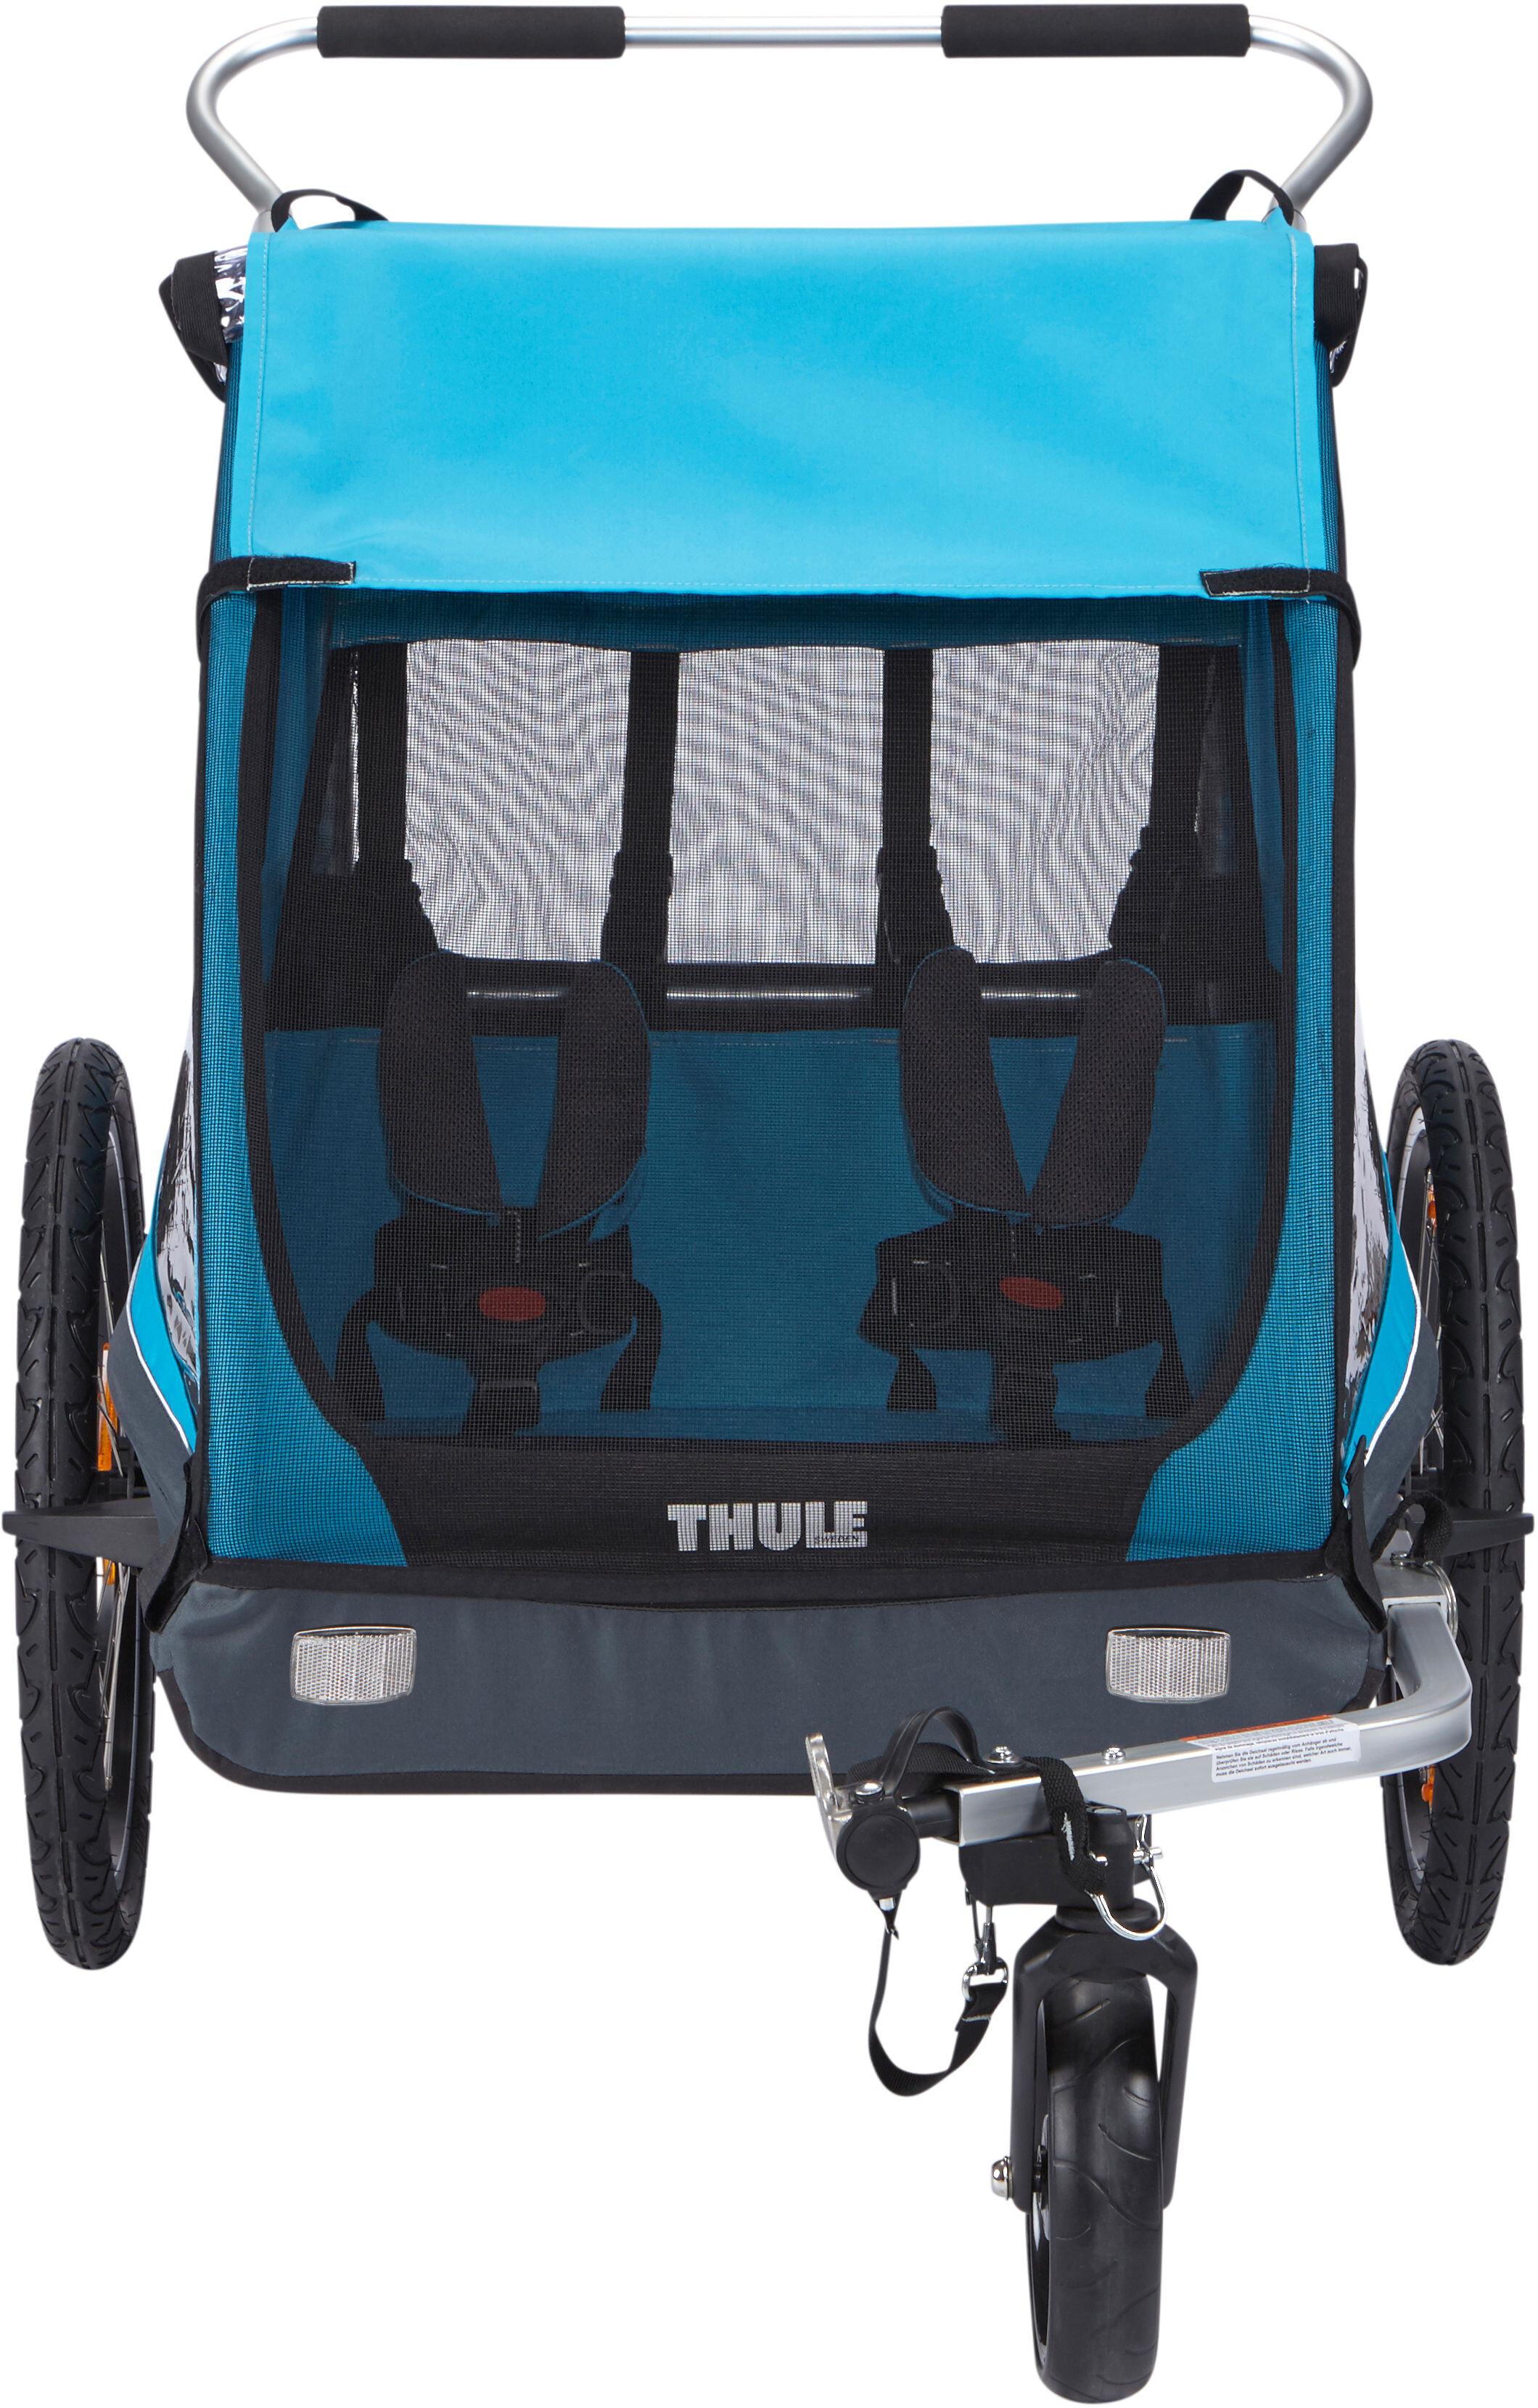 Thule Coaster XT Bike Trailer blue at Bikester.co.uk